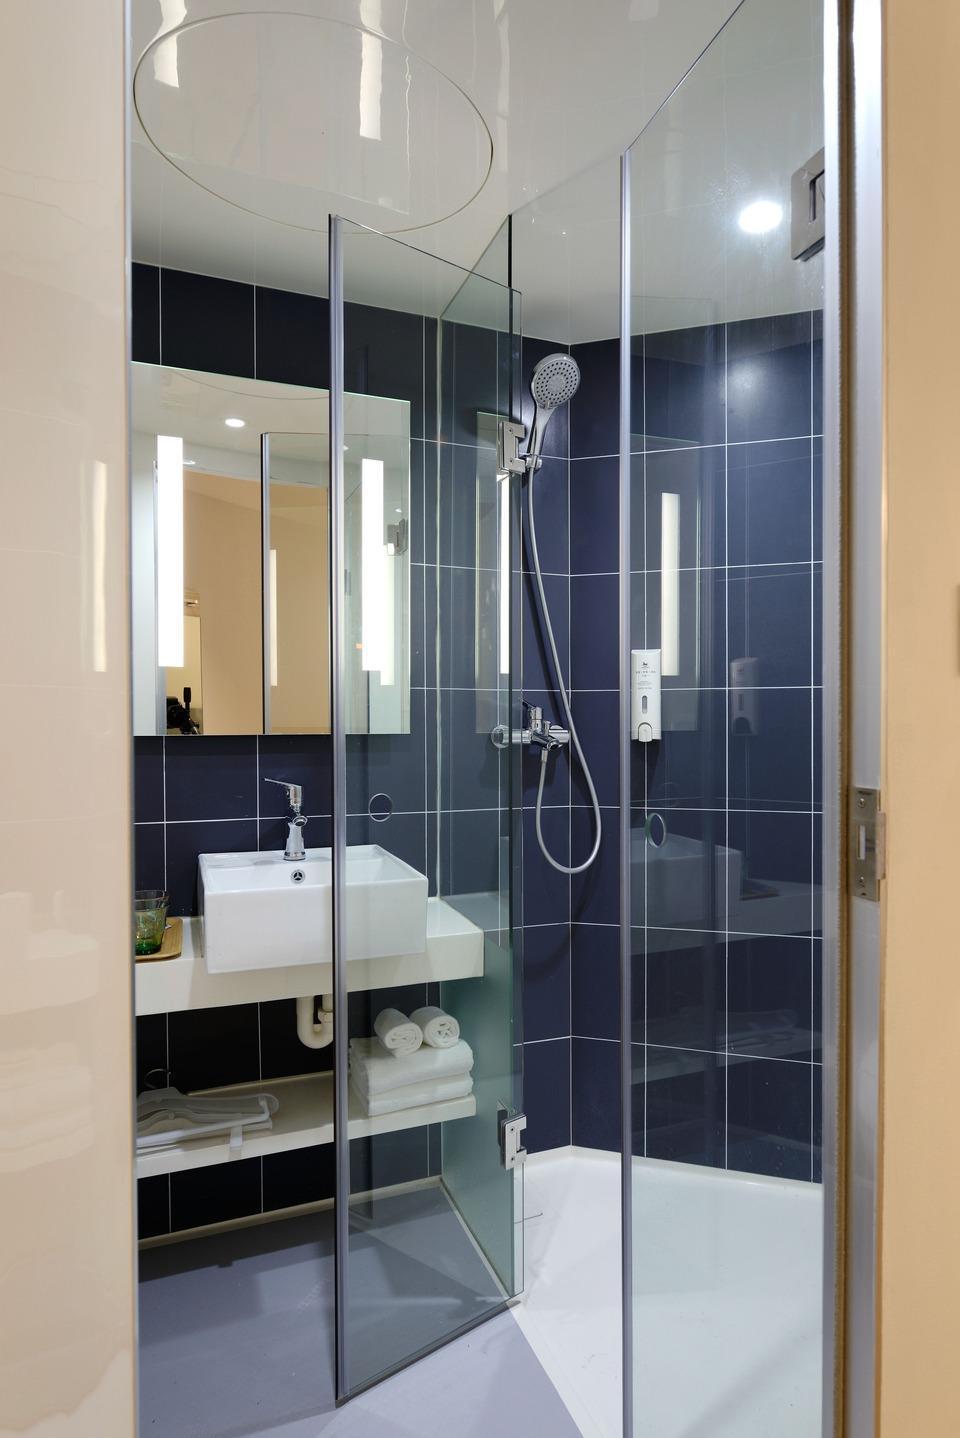 Hotel Qaqa Tttest Domestik - Blue Bathroom